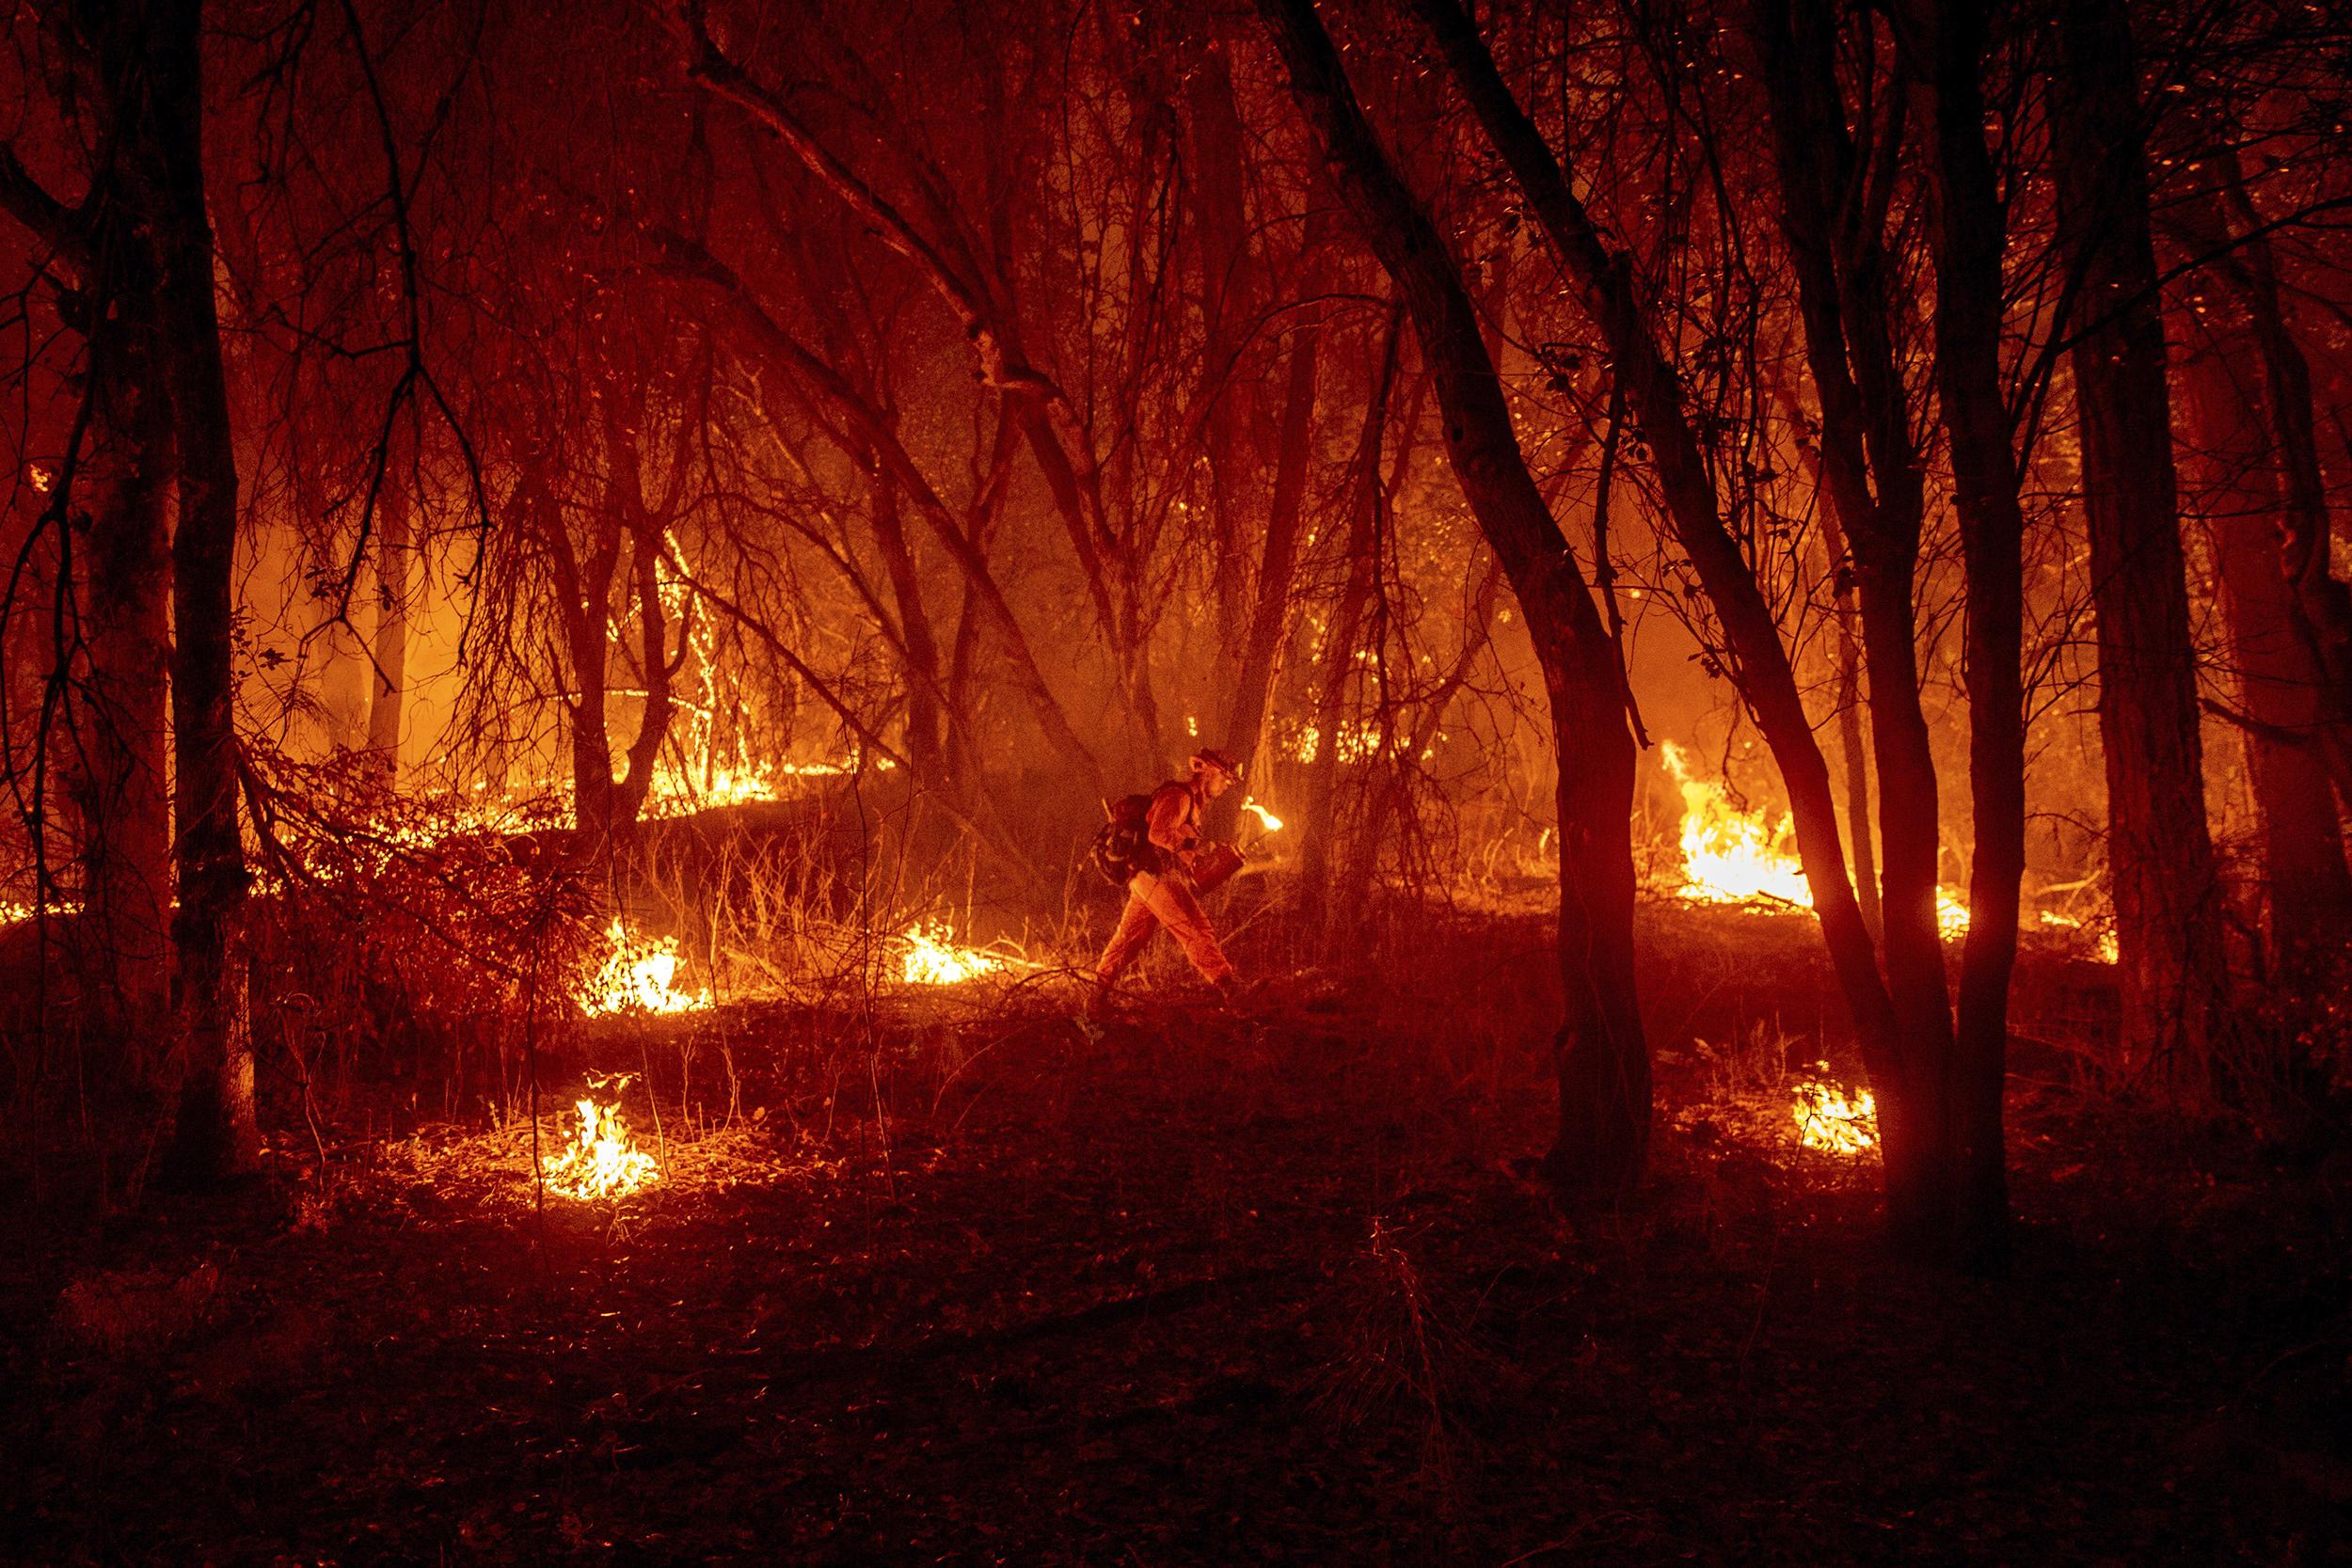 Ex-yoga teacher accused of arson in destructive Northern California blaze